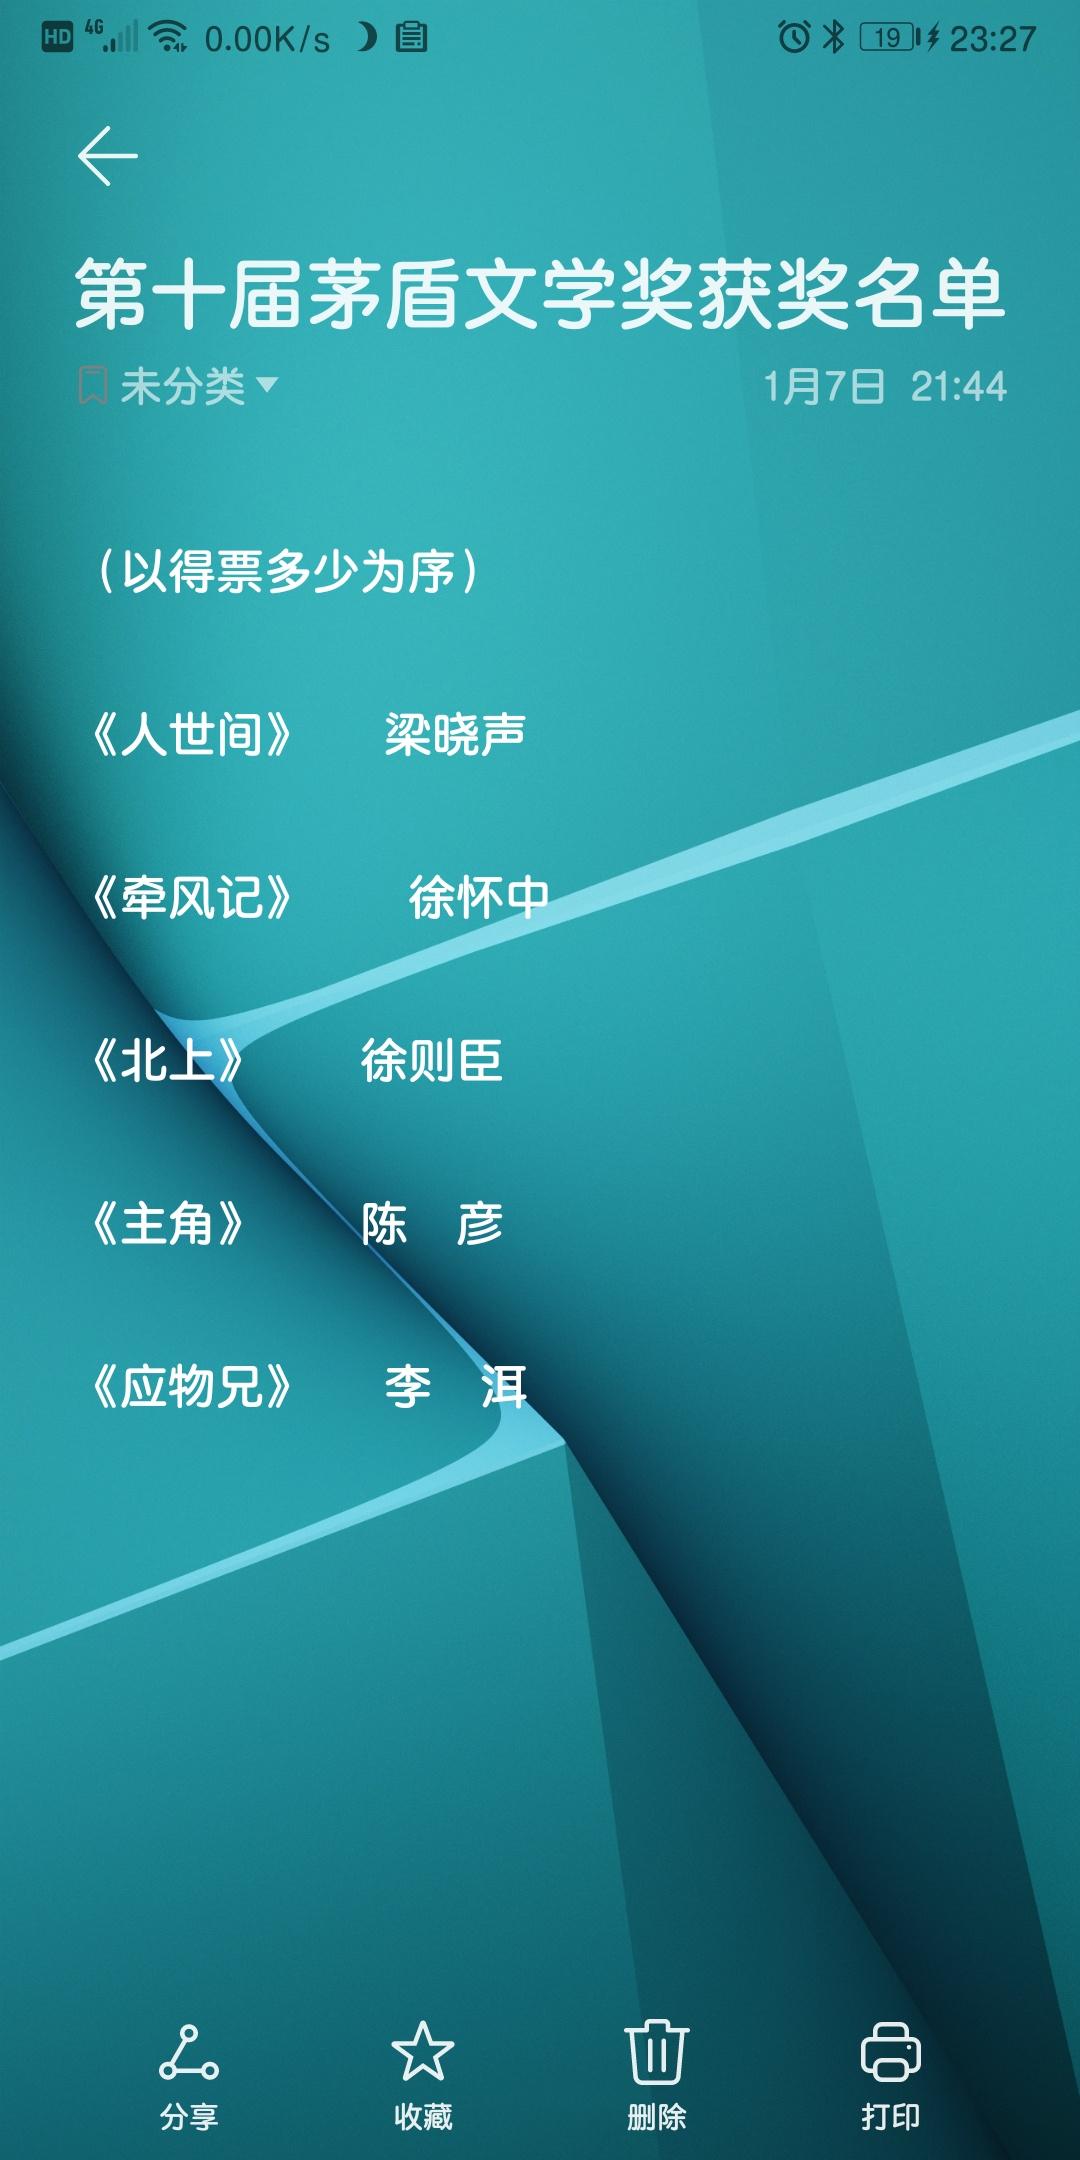 Screenshot_20200112_232745_com.example.android.notepad.jpg